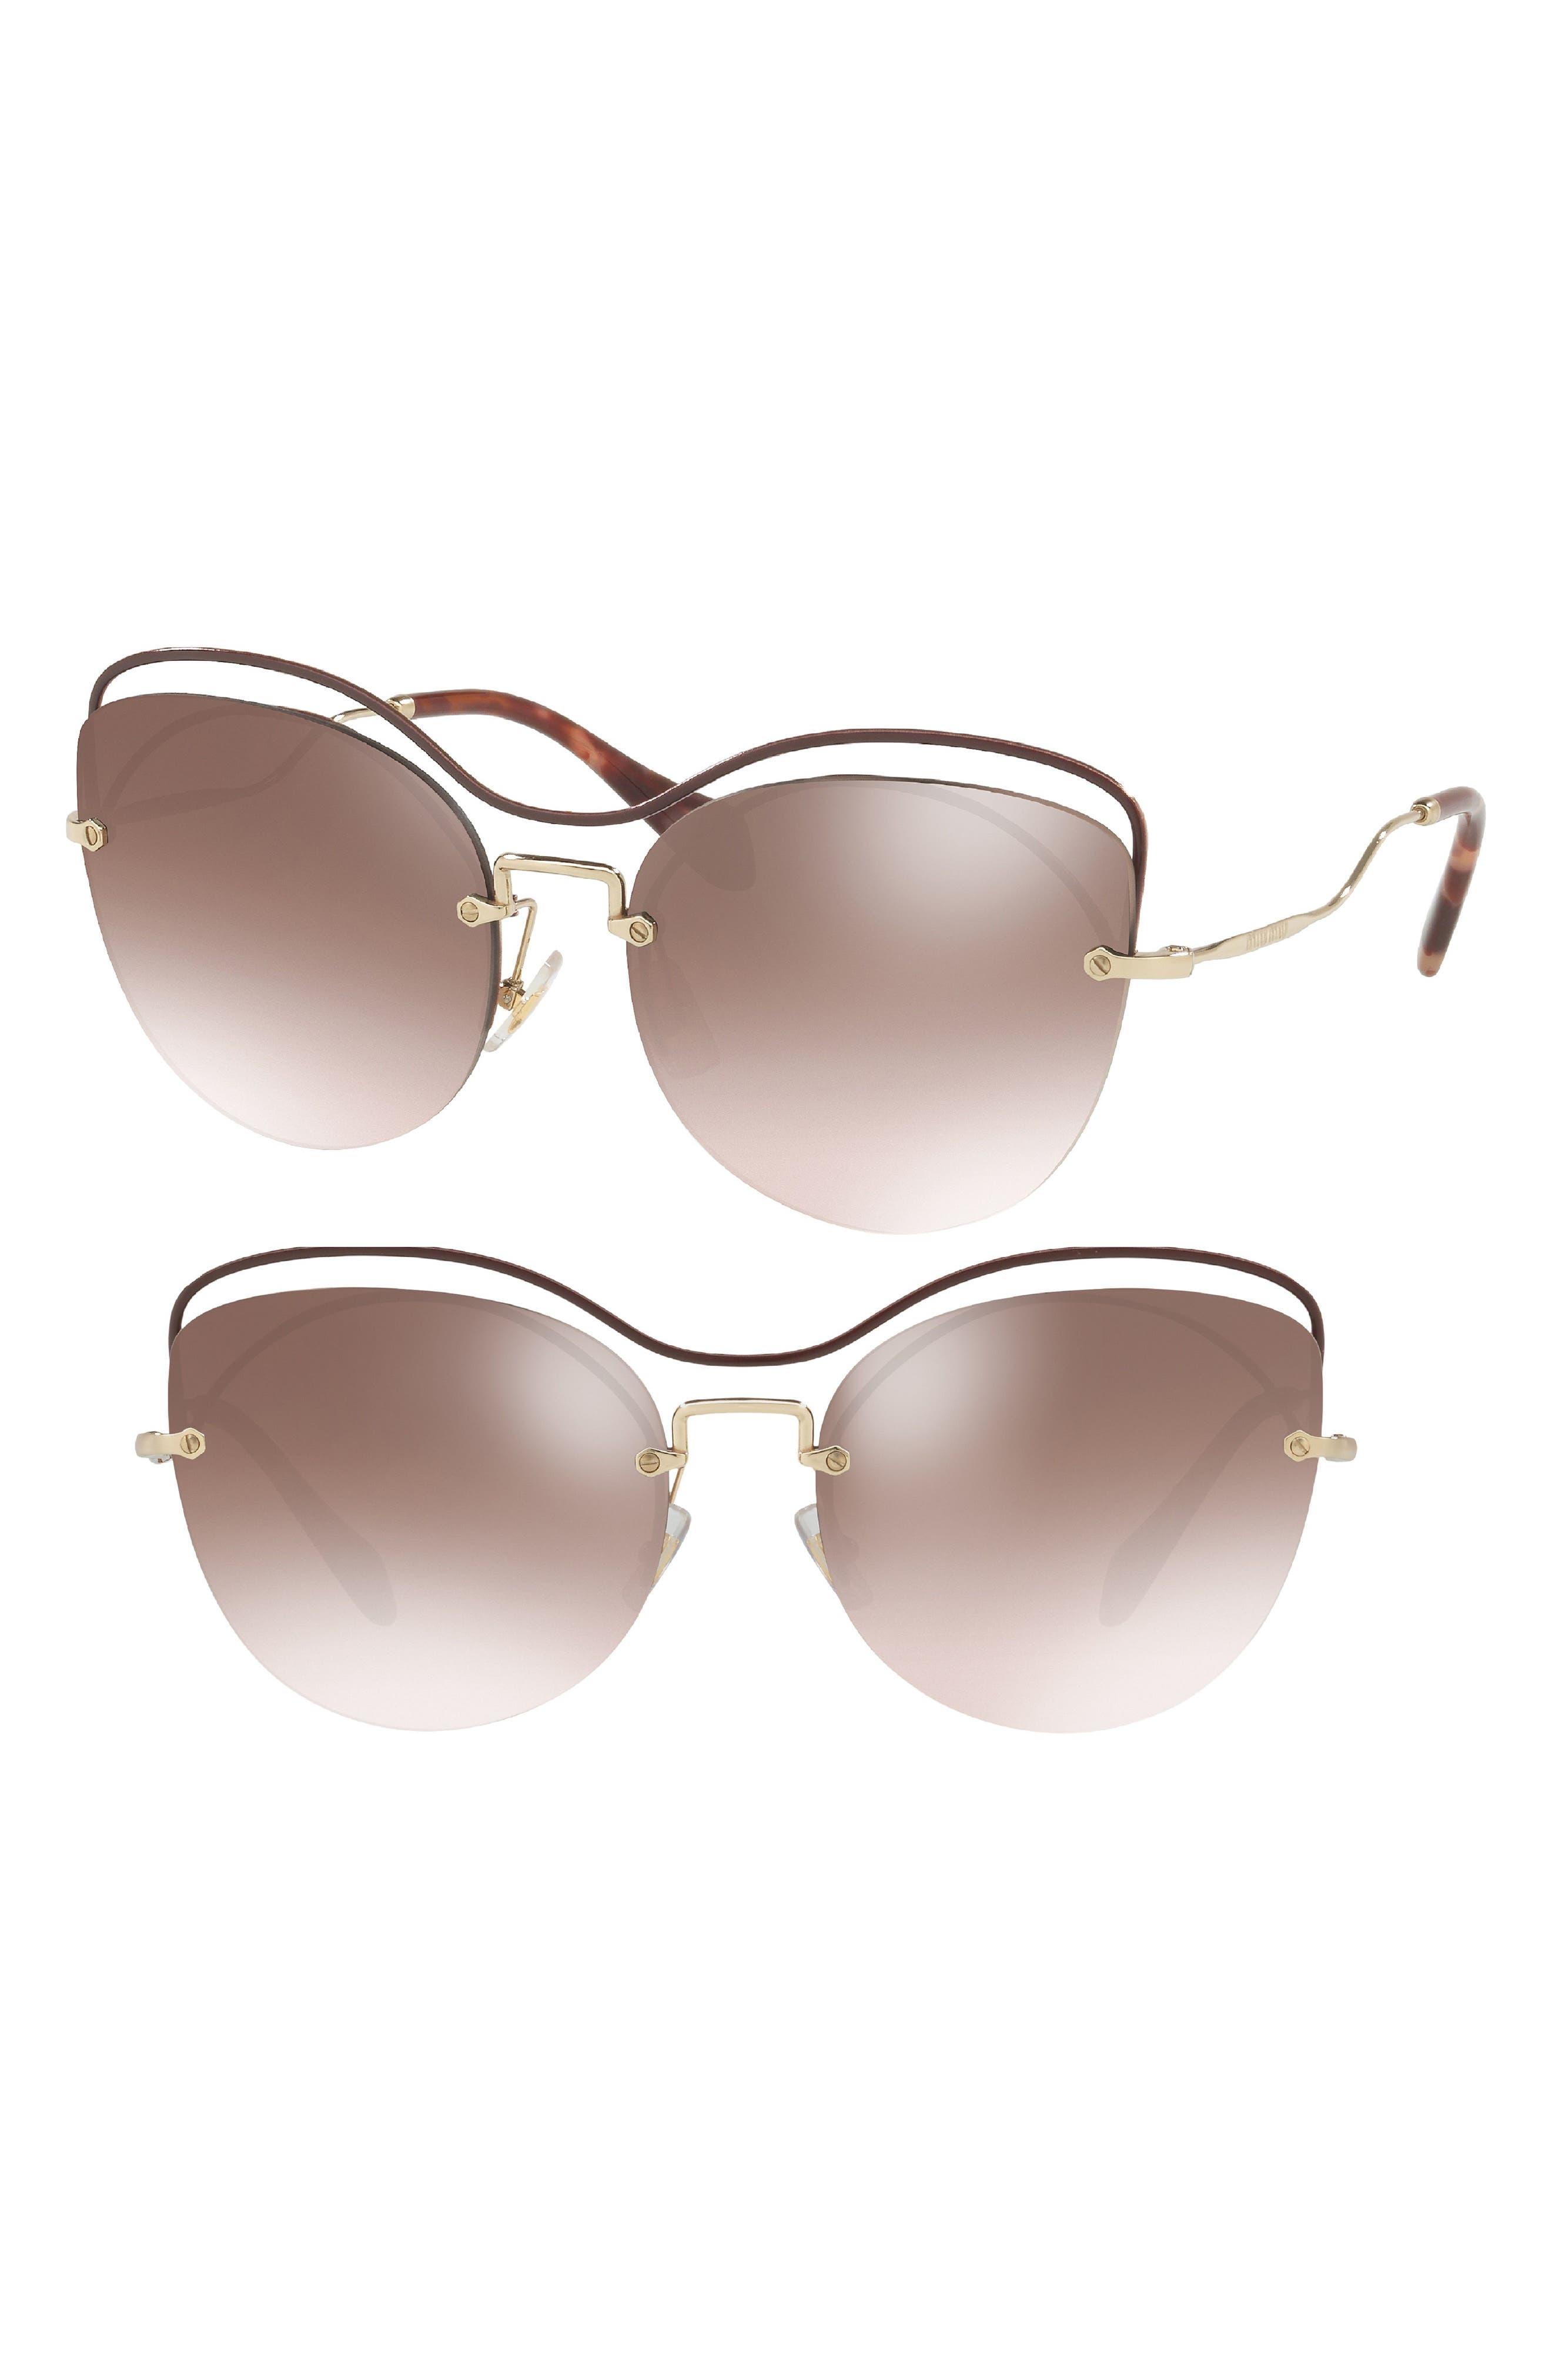 60mm Mirrored Cat Eye Sunglasses,                             Main thumbnail 1, color,                             Brown